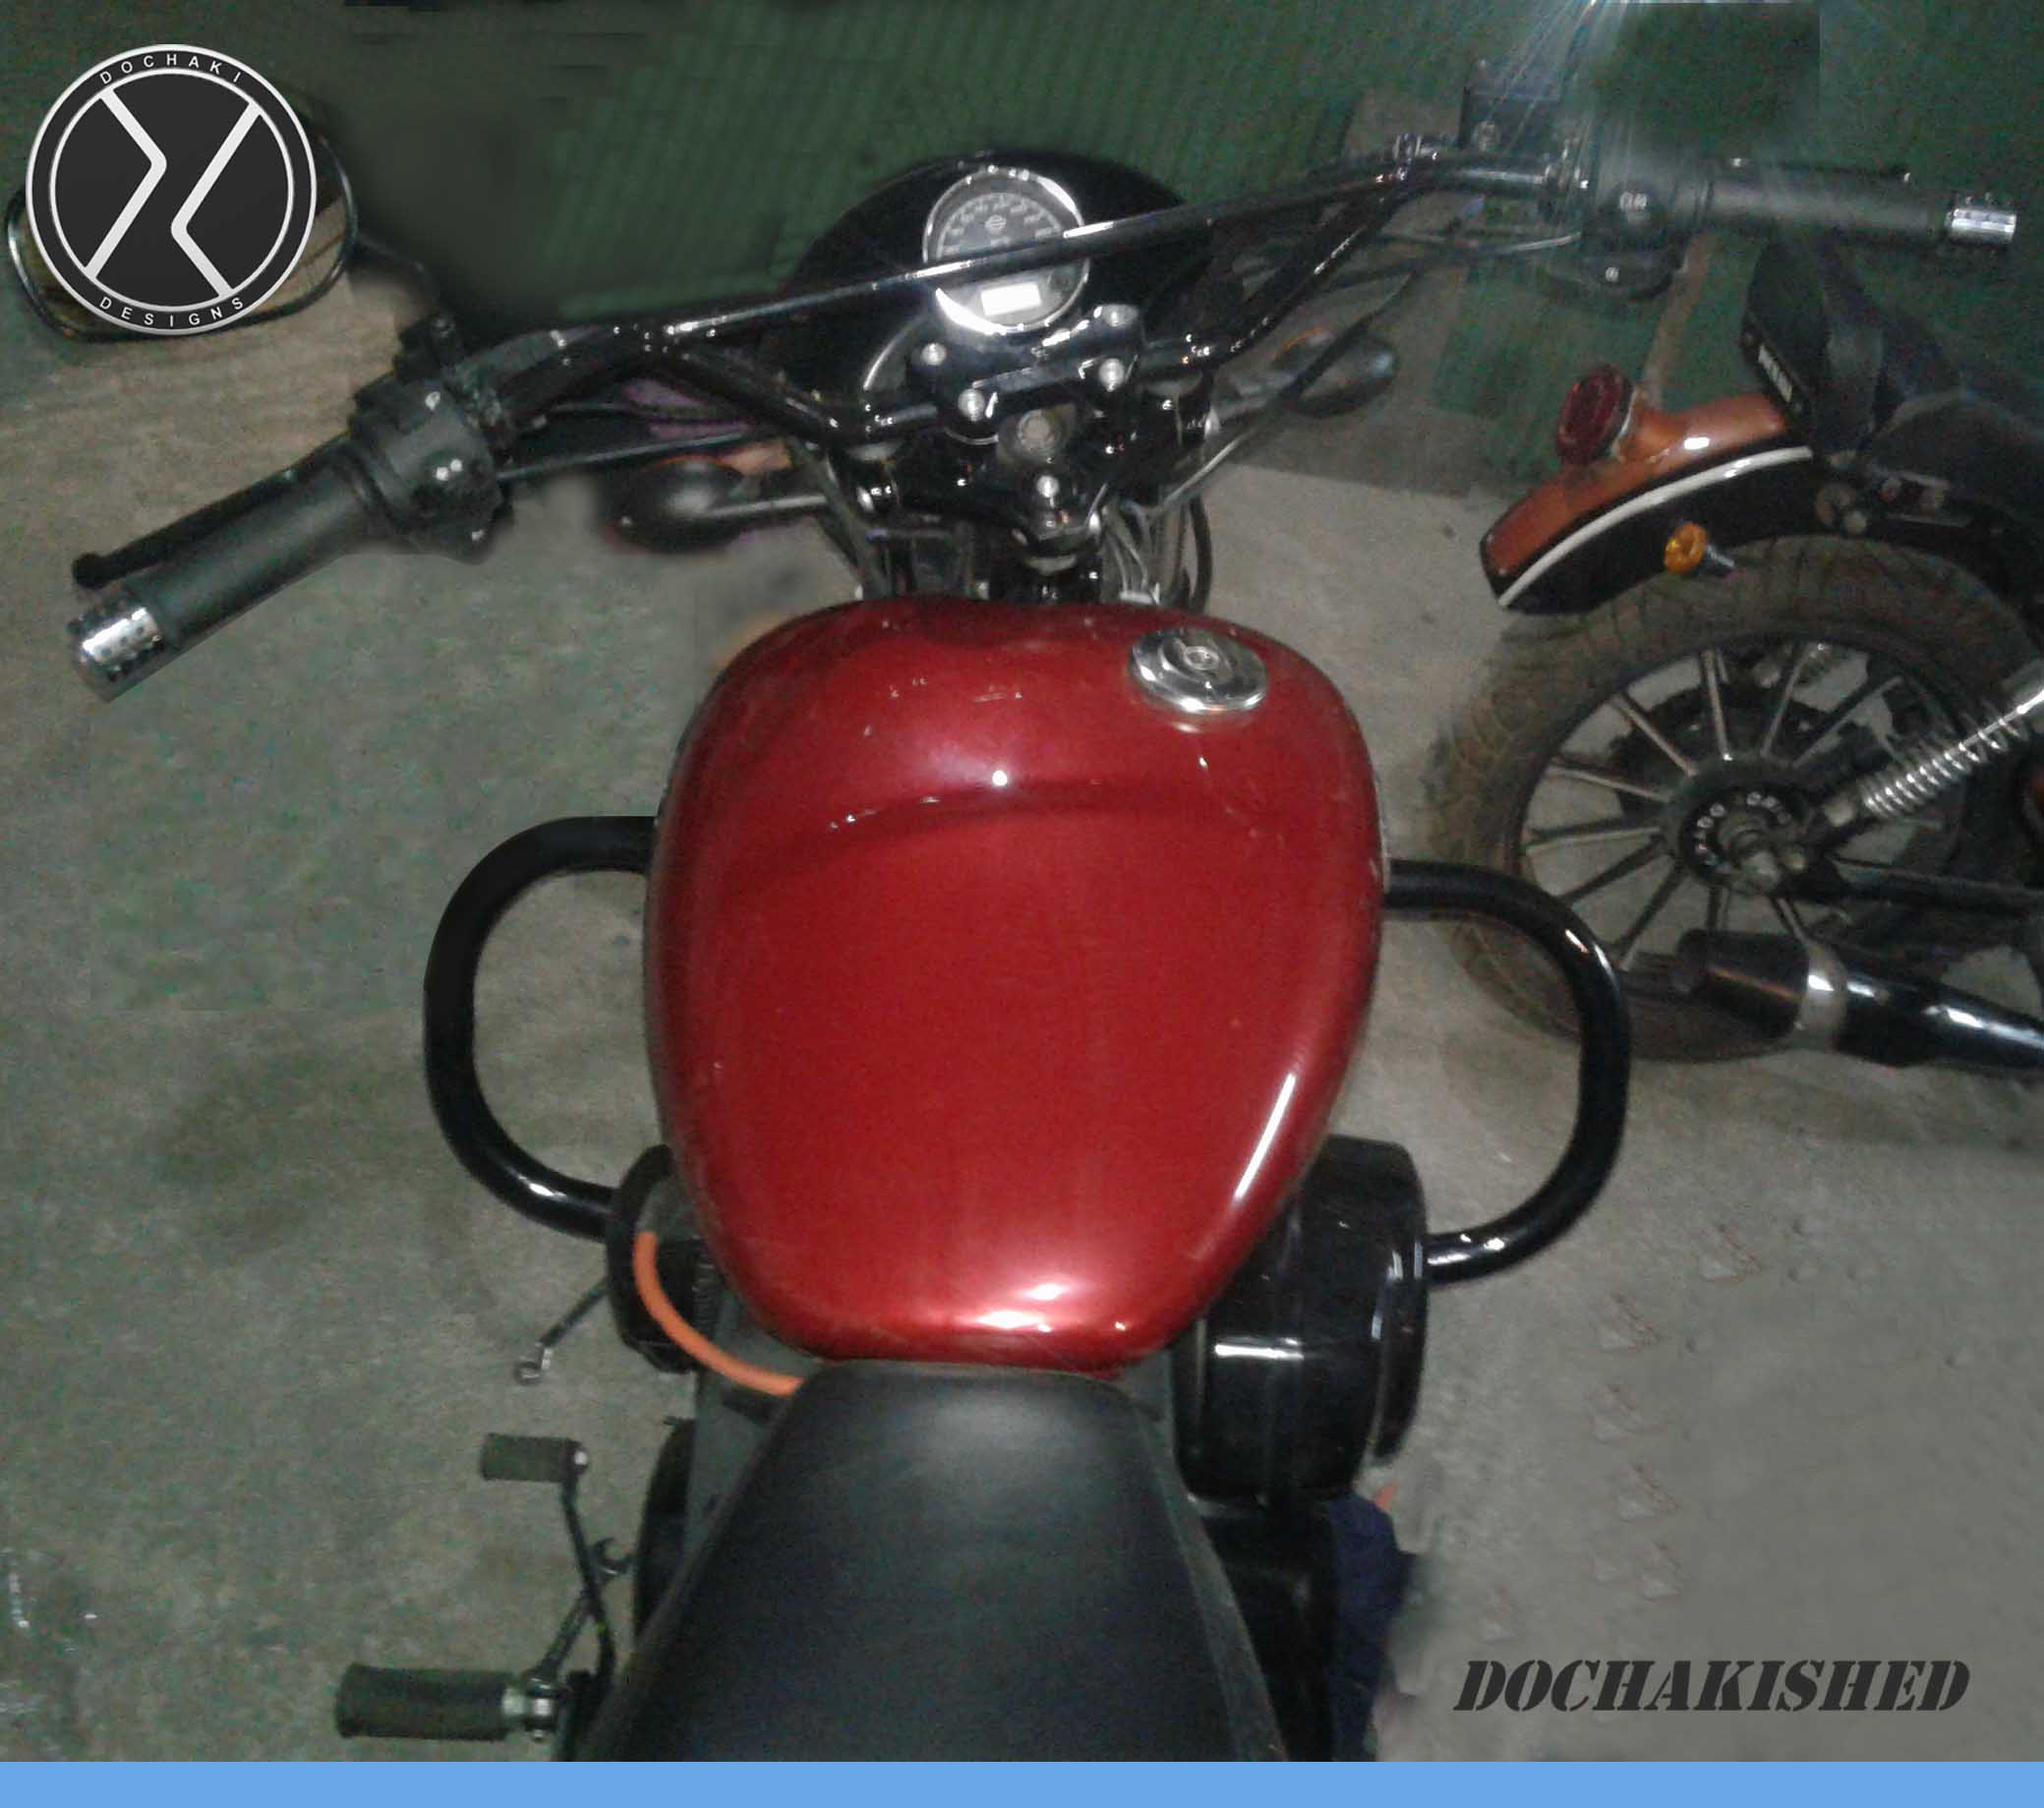 Harley Davidson, Street 750, Crash Guard, Accessories, Pune, Bhopal,